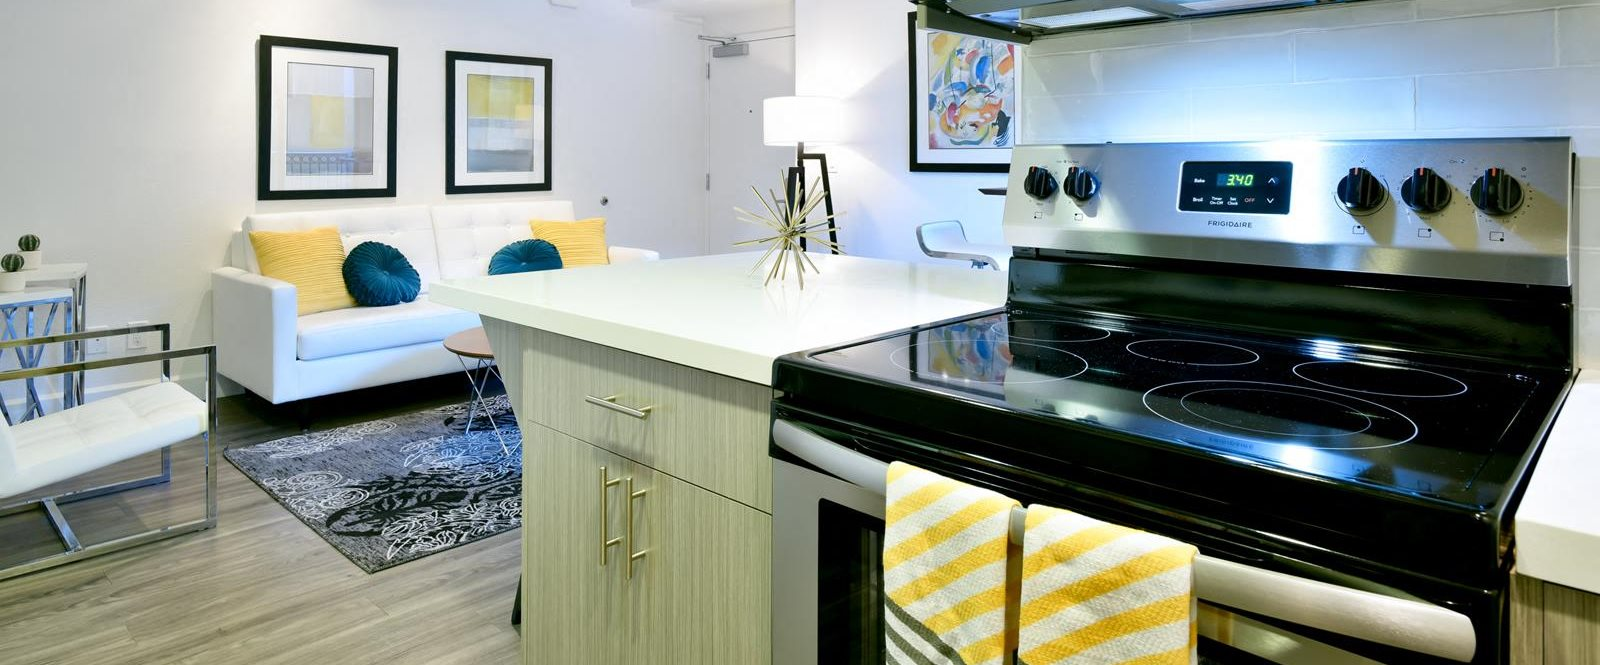 Image result for 1122u apartment